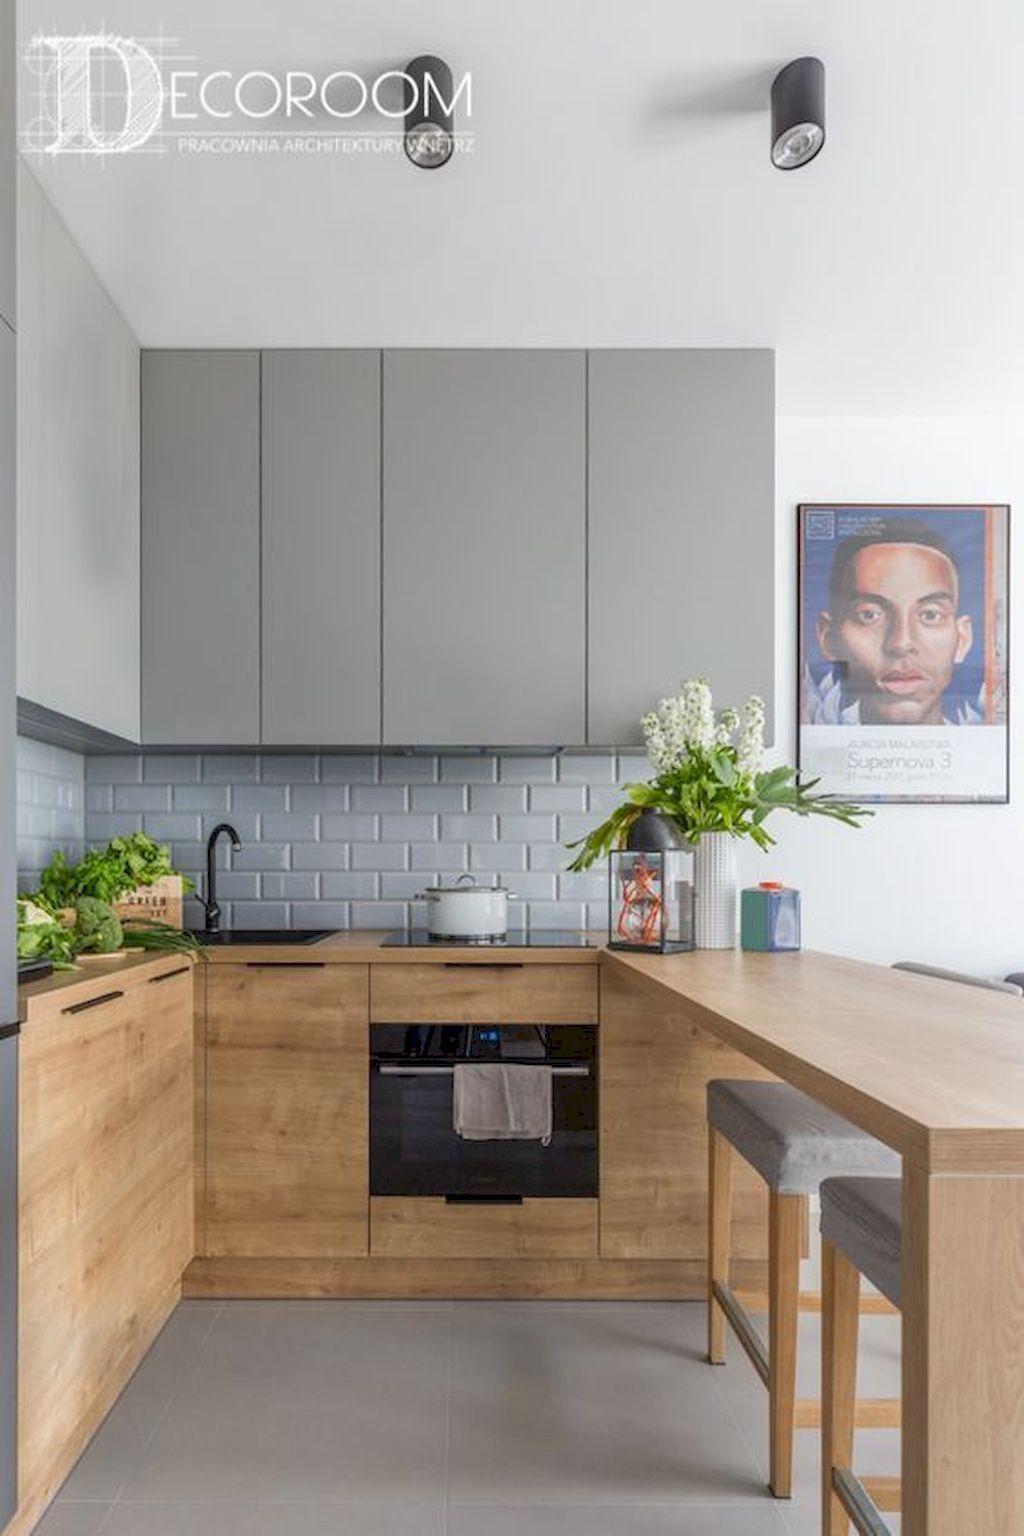 Awesome Scandinavian Kitchen Remodel 3 Projetos De Cozinhas